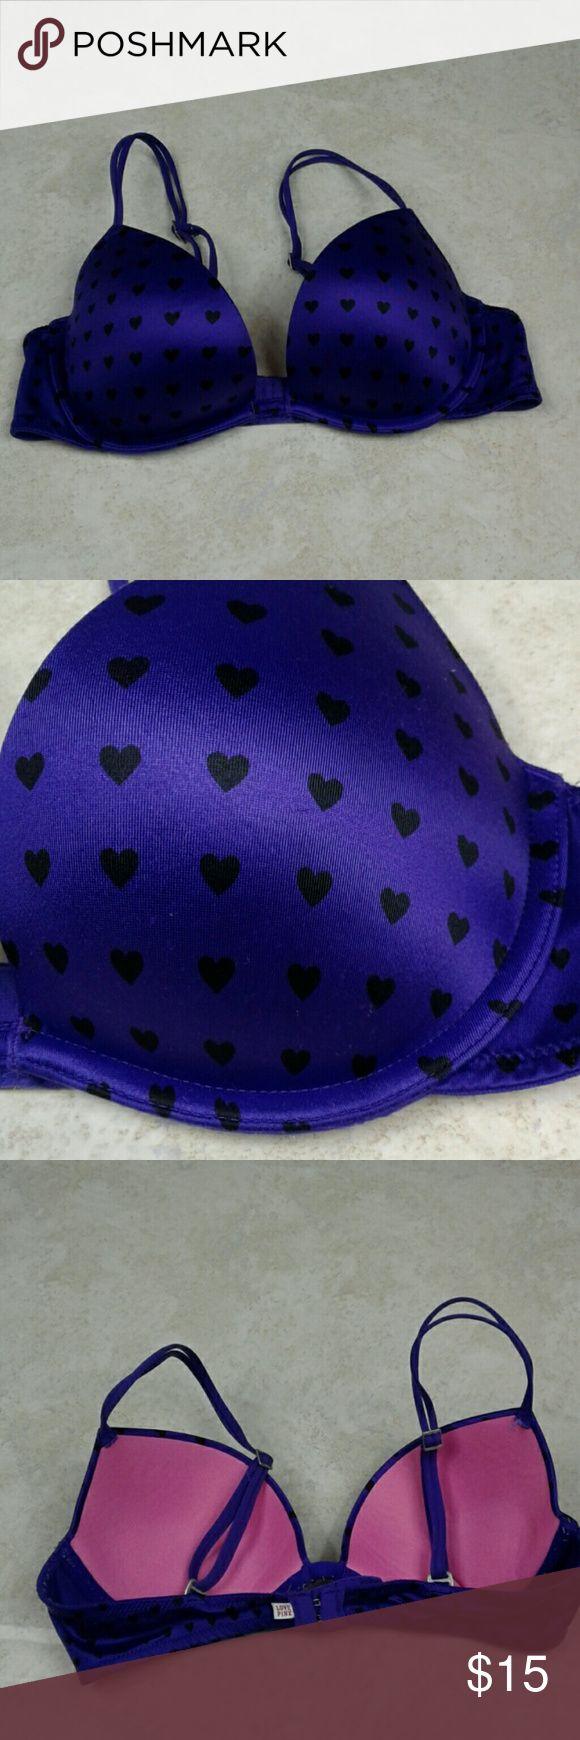 Victoria's Secret pink push purple hearts bra. 34B Excellent condition purple eggplant color. With black heart designs. Size 34B underwire push up bra. Victoria's Secret Intimates & Sleepwear Bras